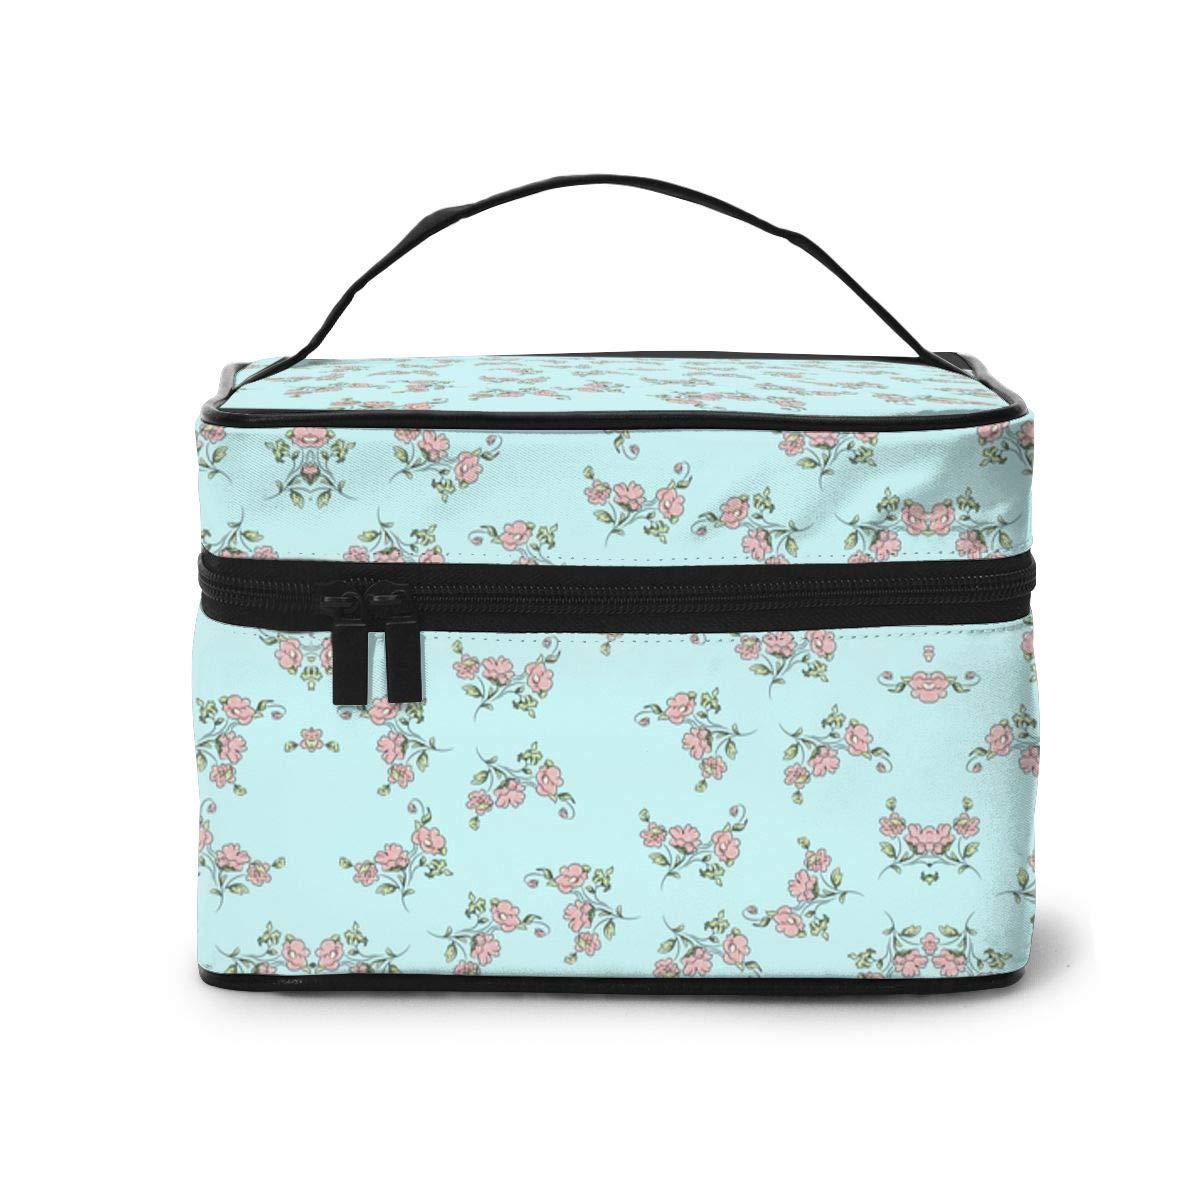 Tengyiyi Elegant Pink Floral Makeup Bag Travel Toiletry BOX Portable Organizer Storage Cosmetic Train Case For Women Girls